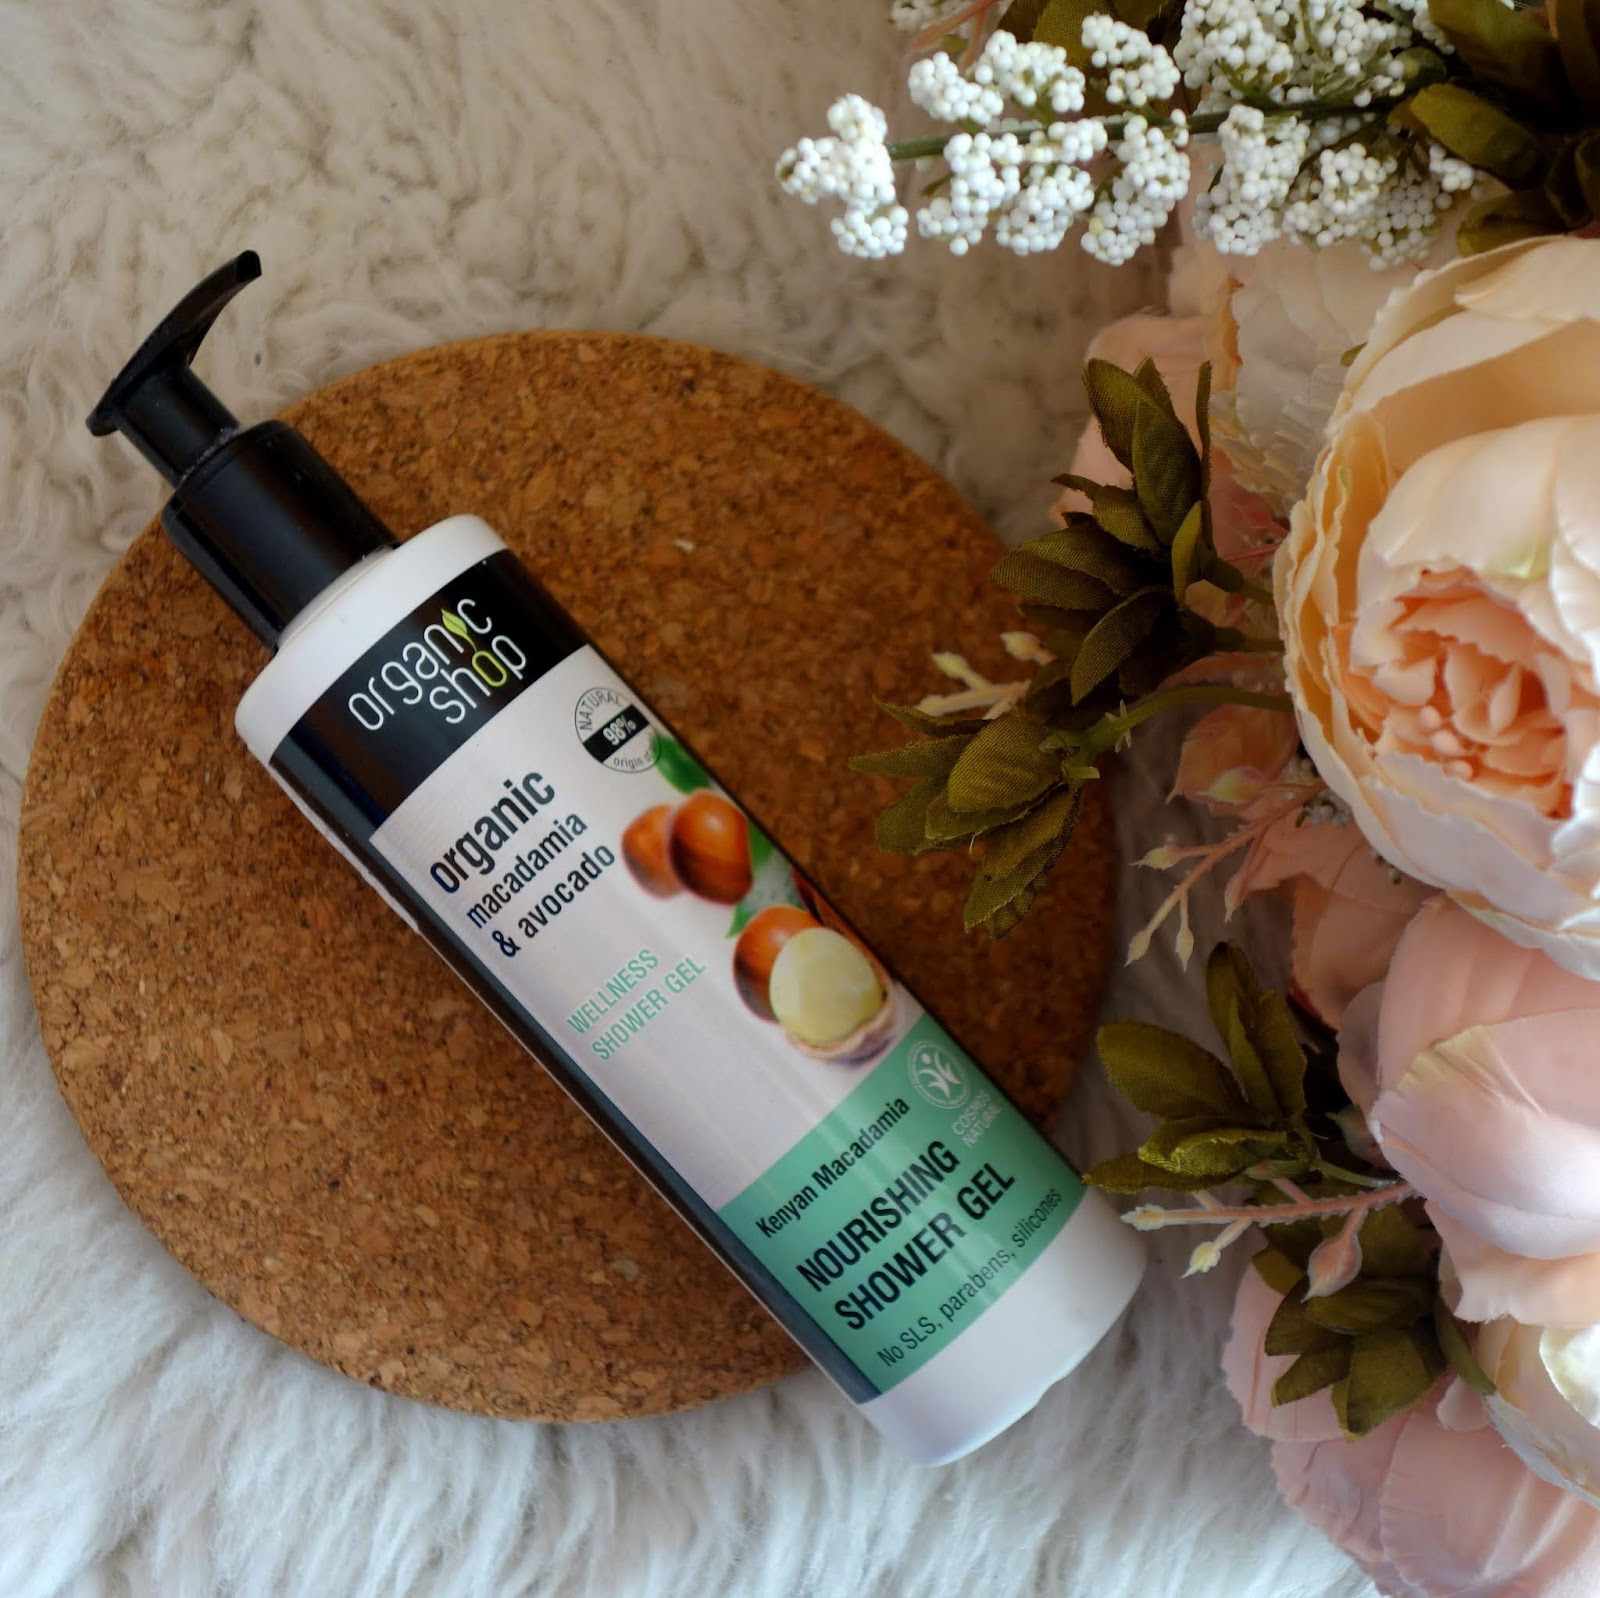 ORGANIC SHOP Organic Macadamia & Avocado Welness Shower Gel